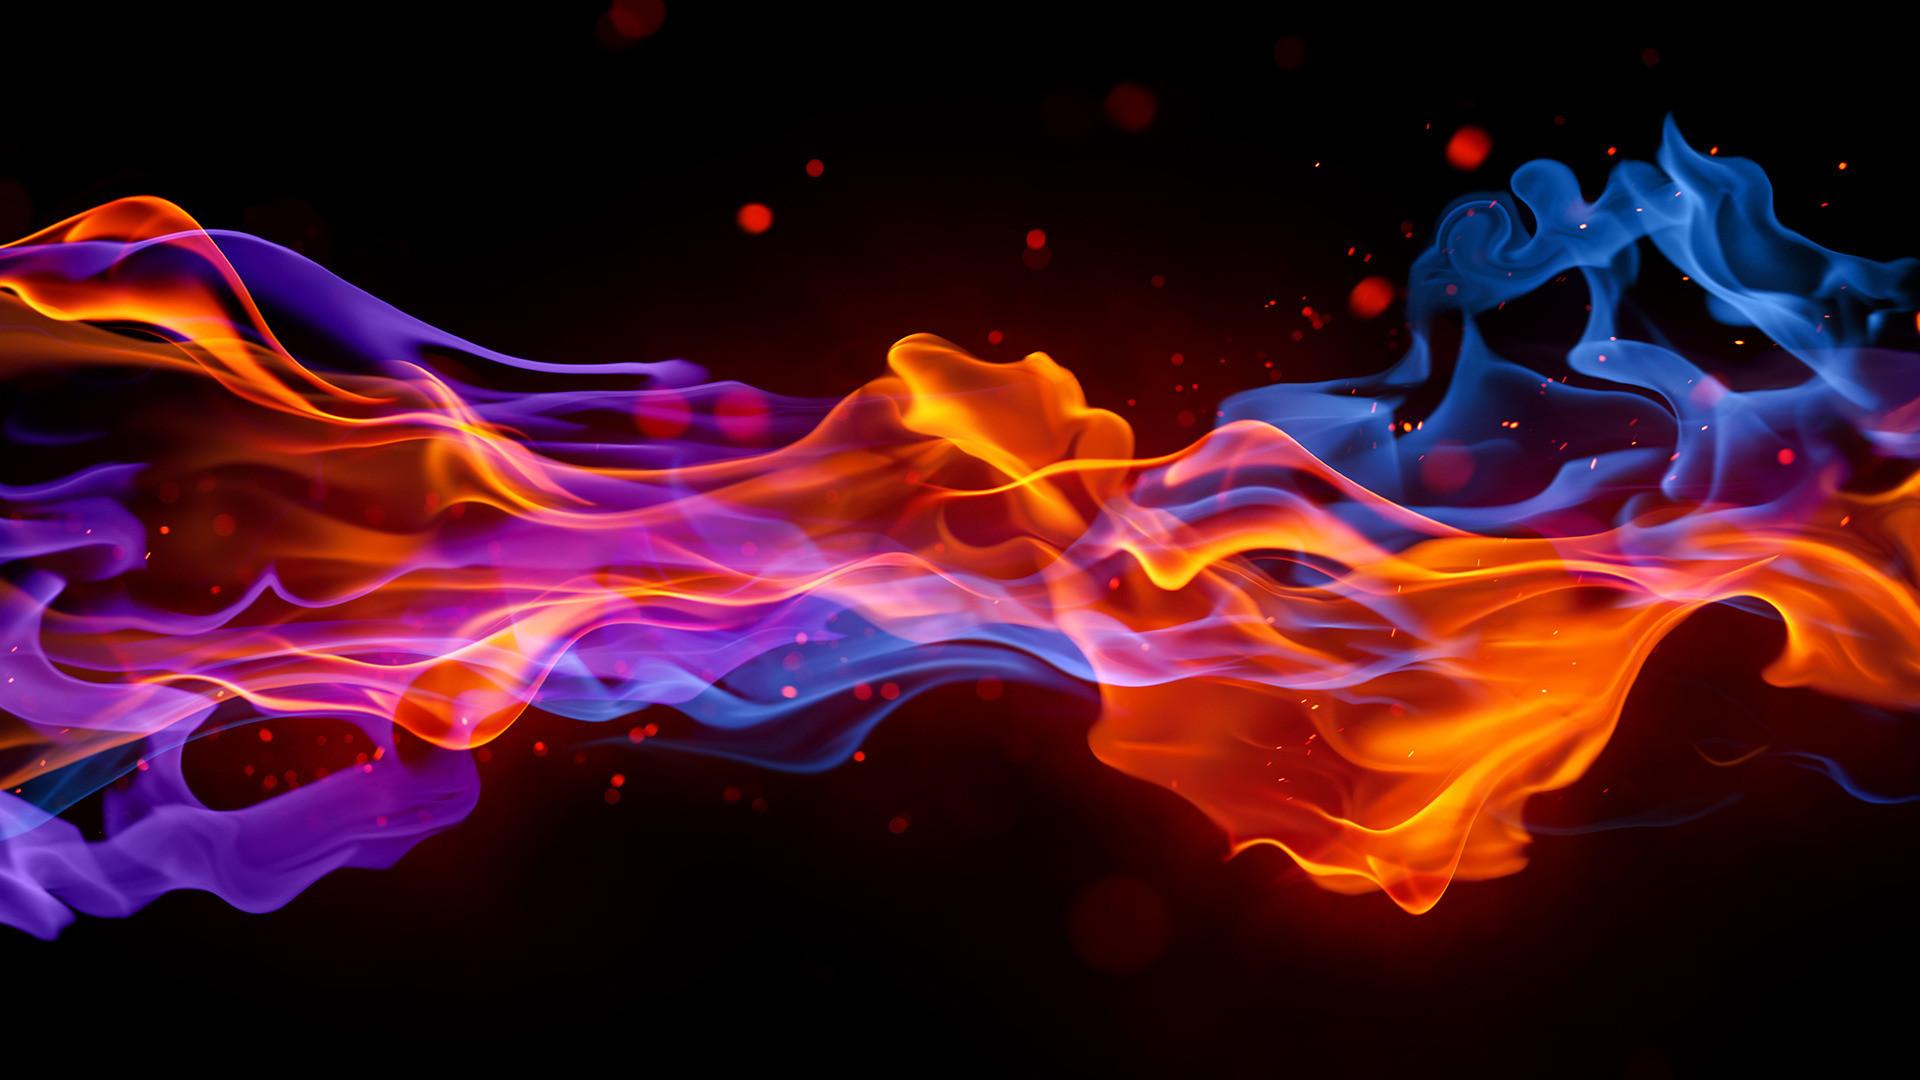 Blue Fire Wallpapers Desktop Background : Abstract Wallpaper .